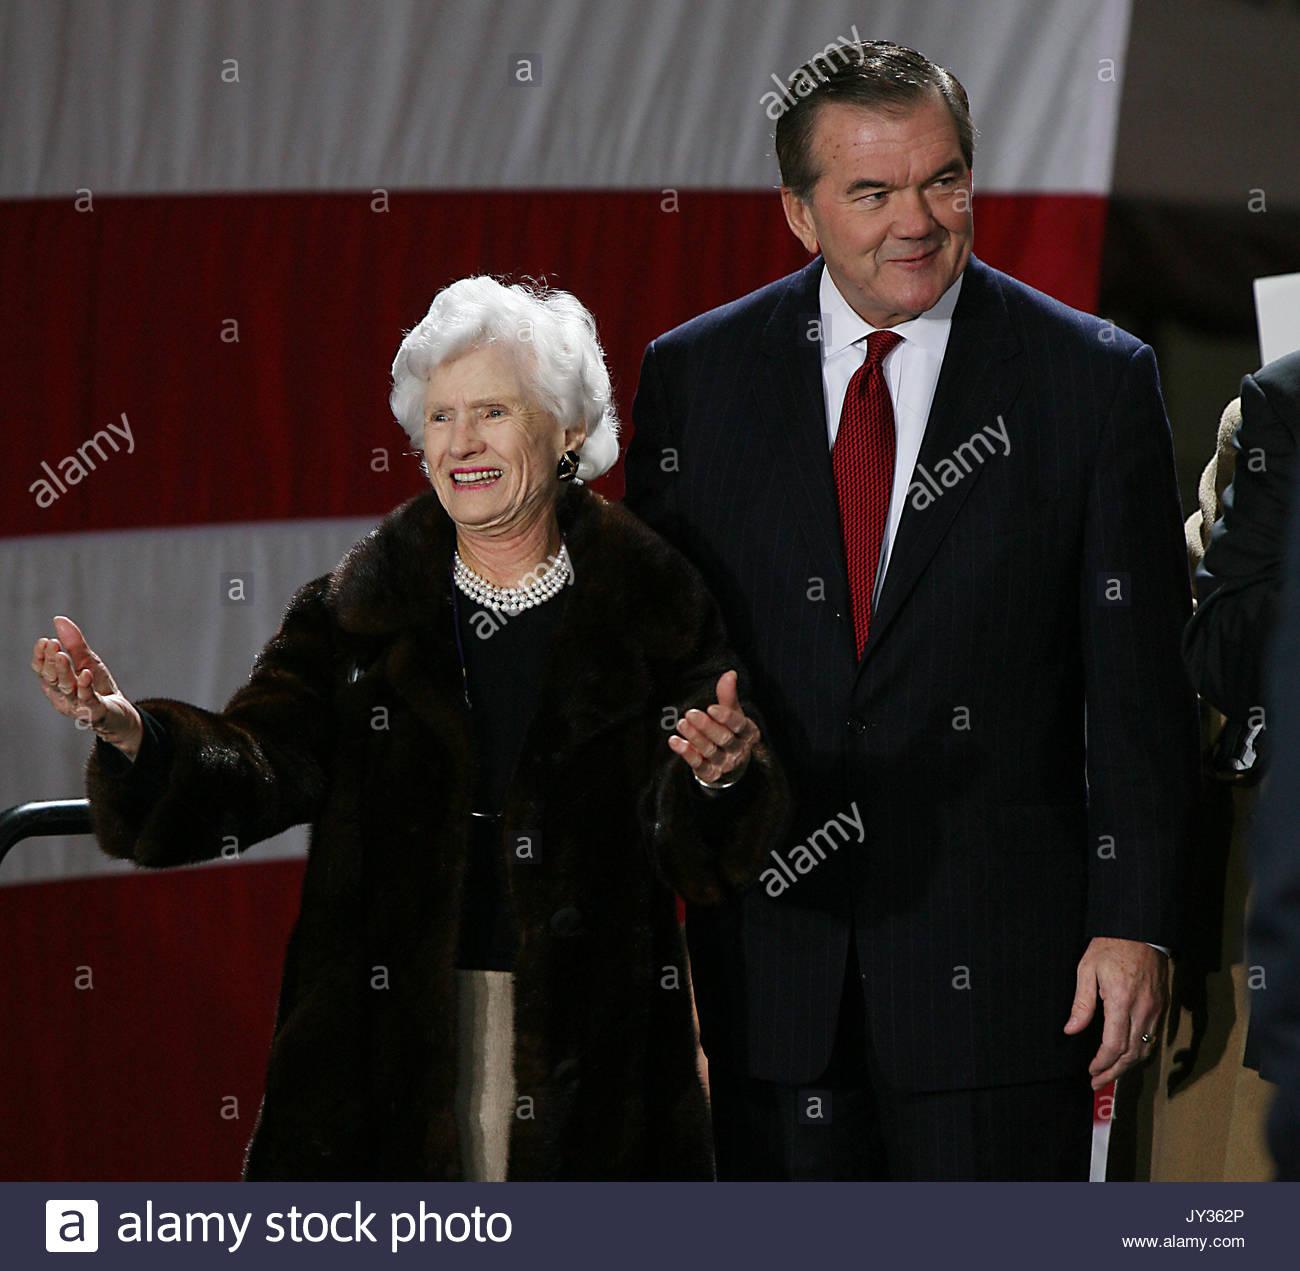 Roberta Mccain: Tom Ridge And Roberta McCain At A Rally In Rockefeller